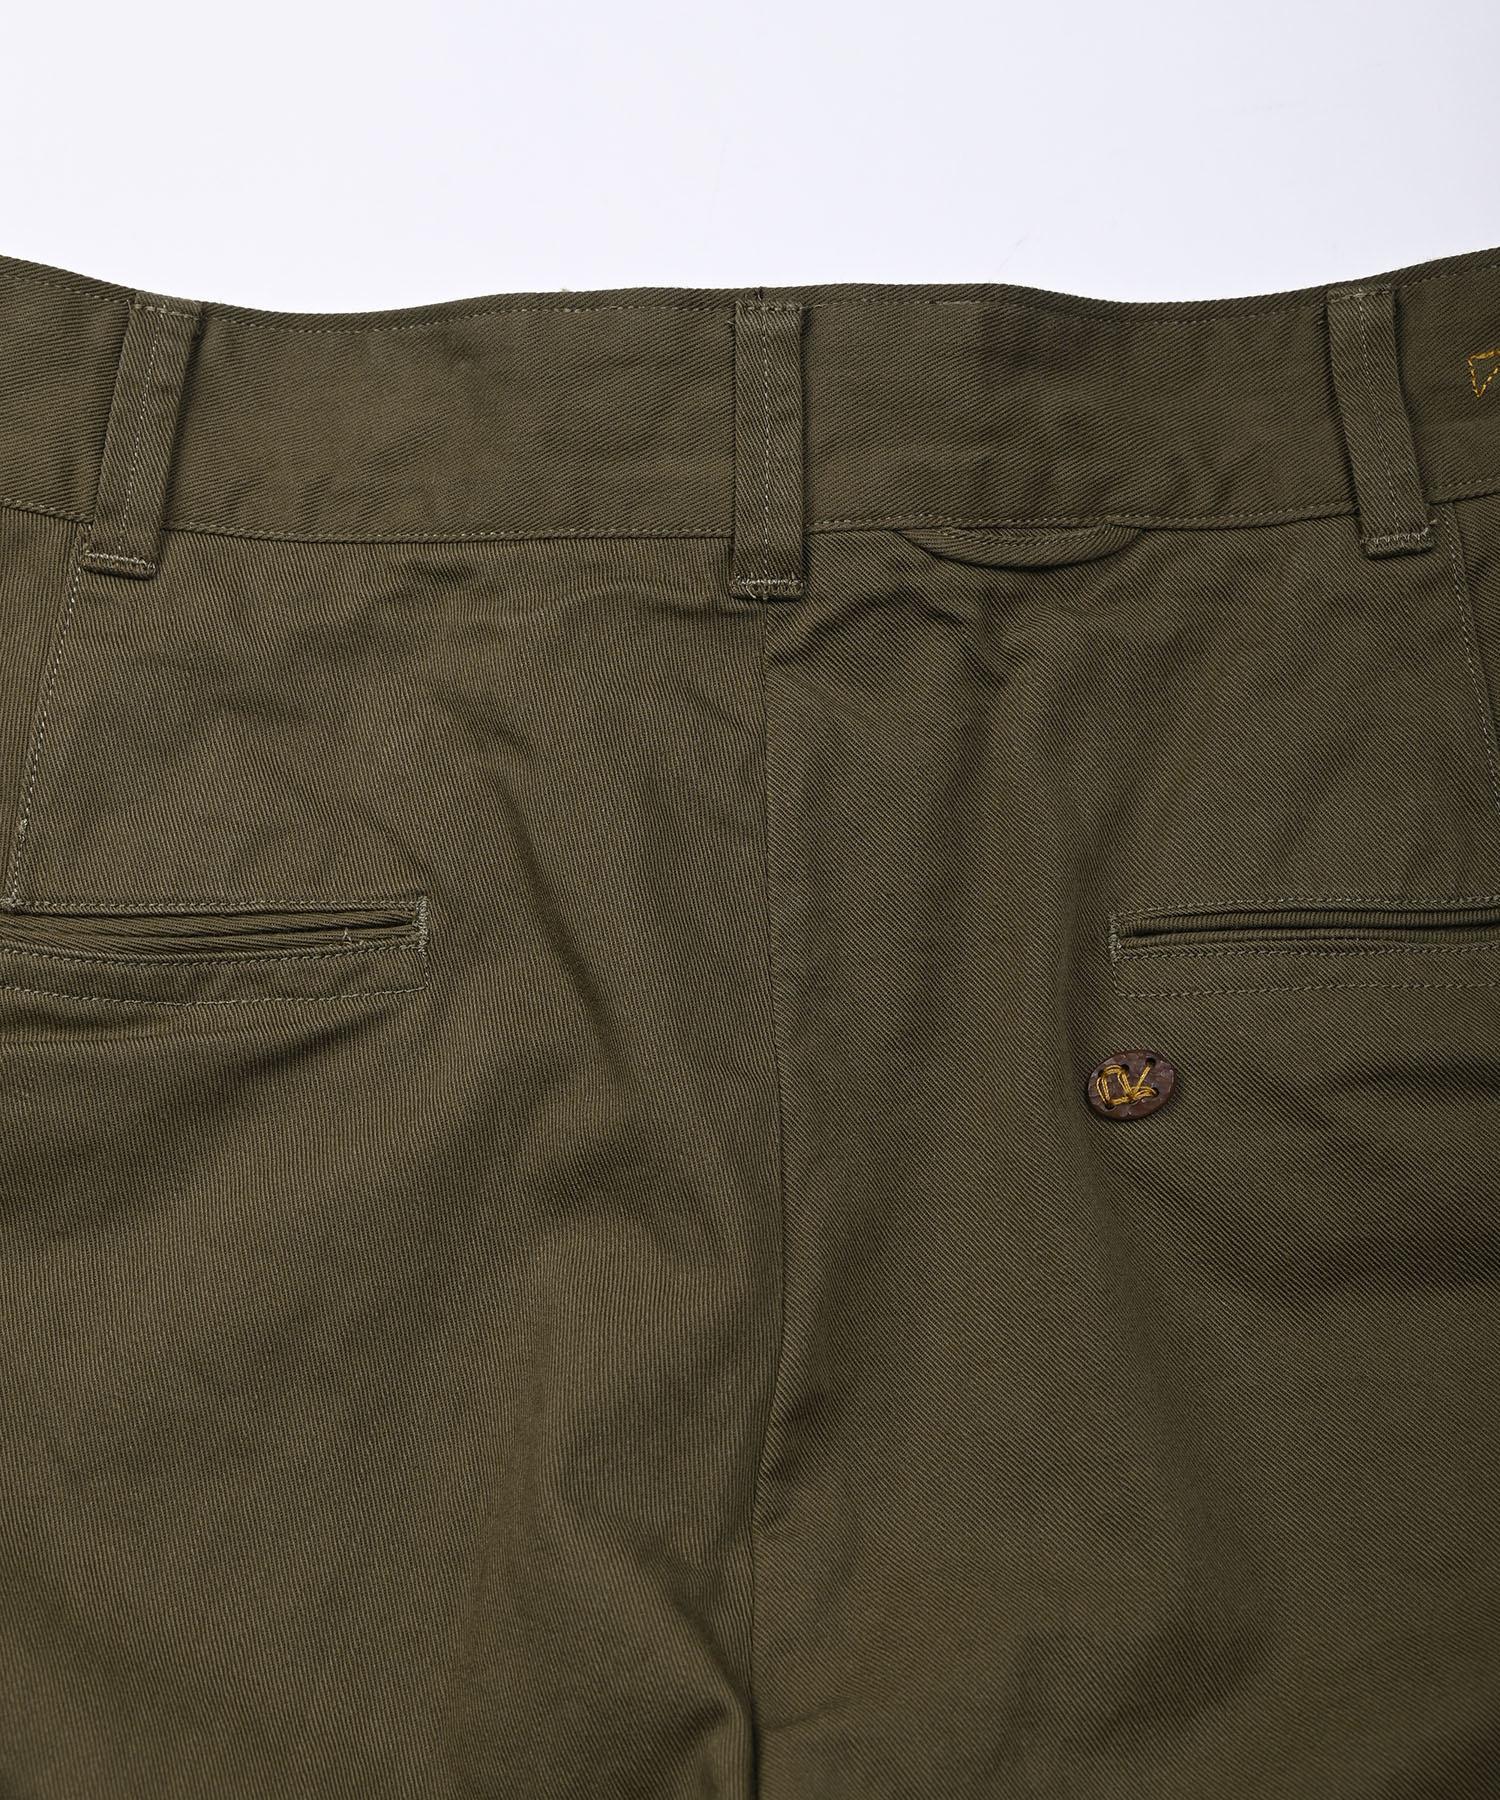 Okome Chino 908 Pants (0421)-7